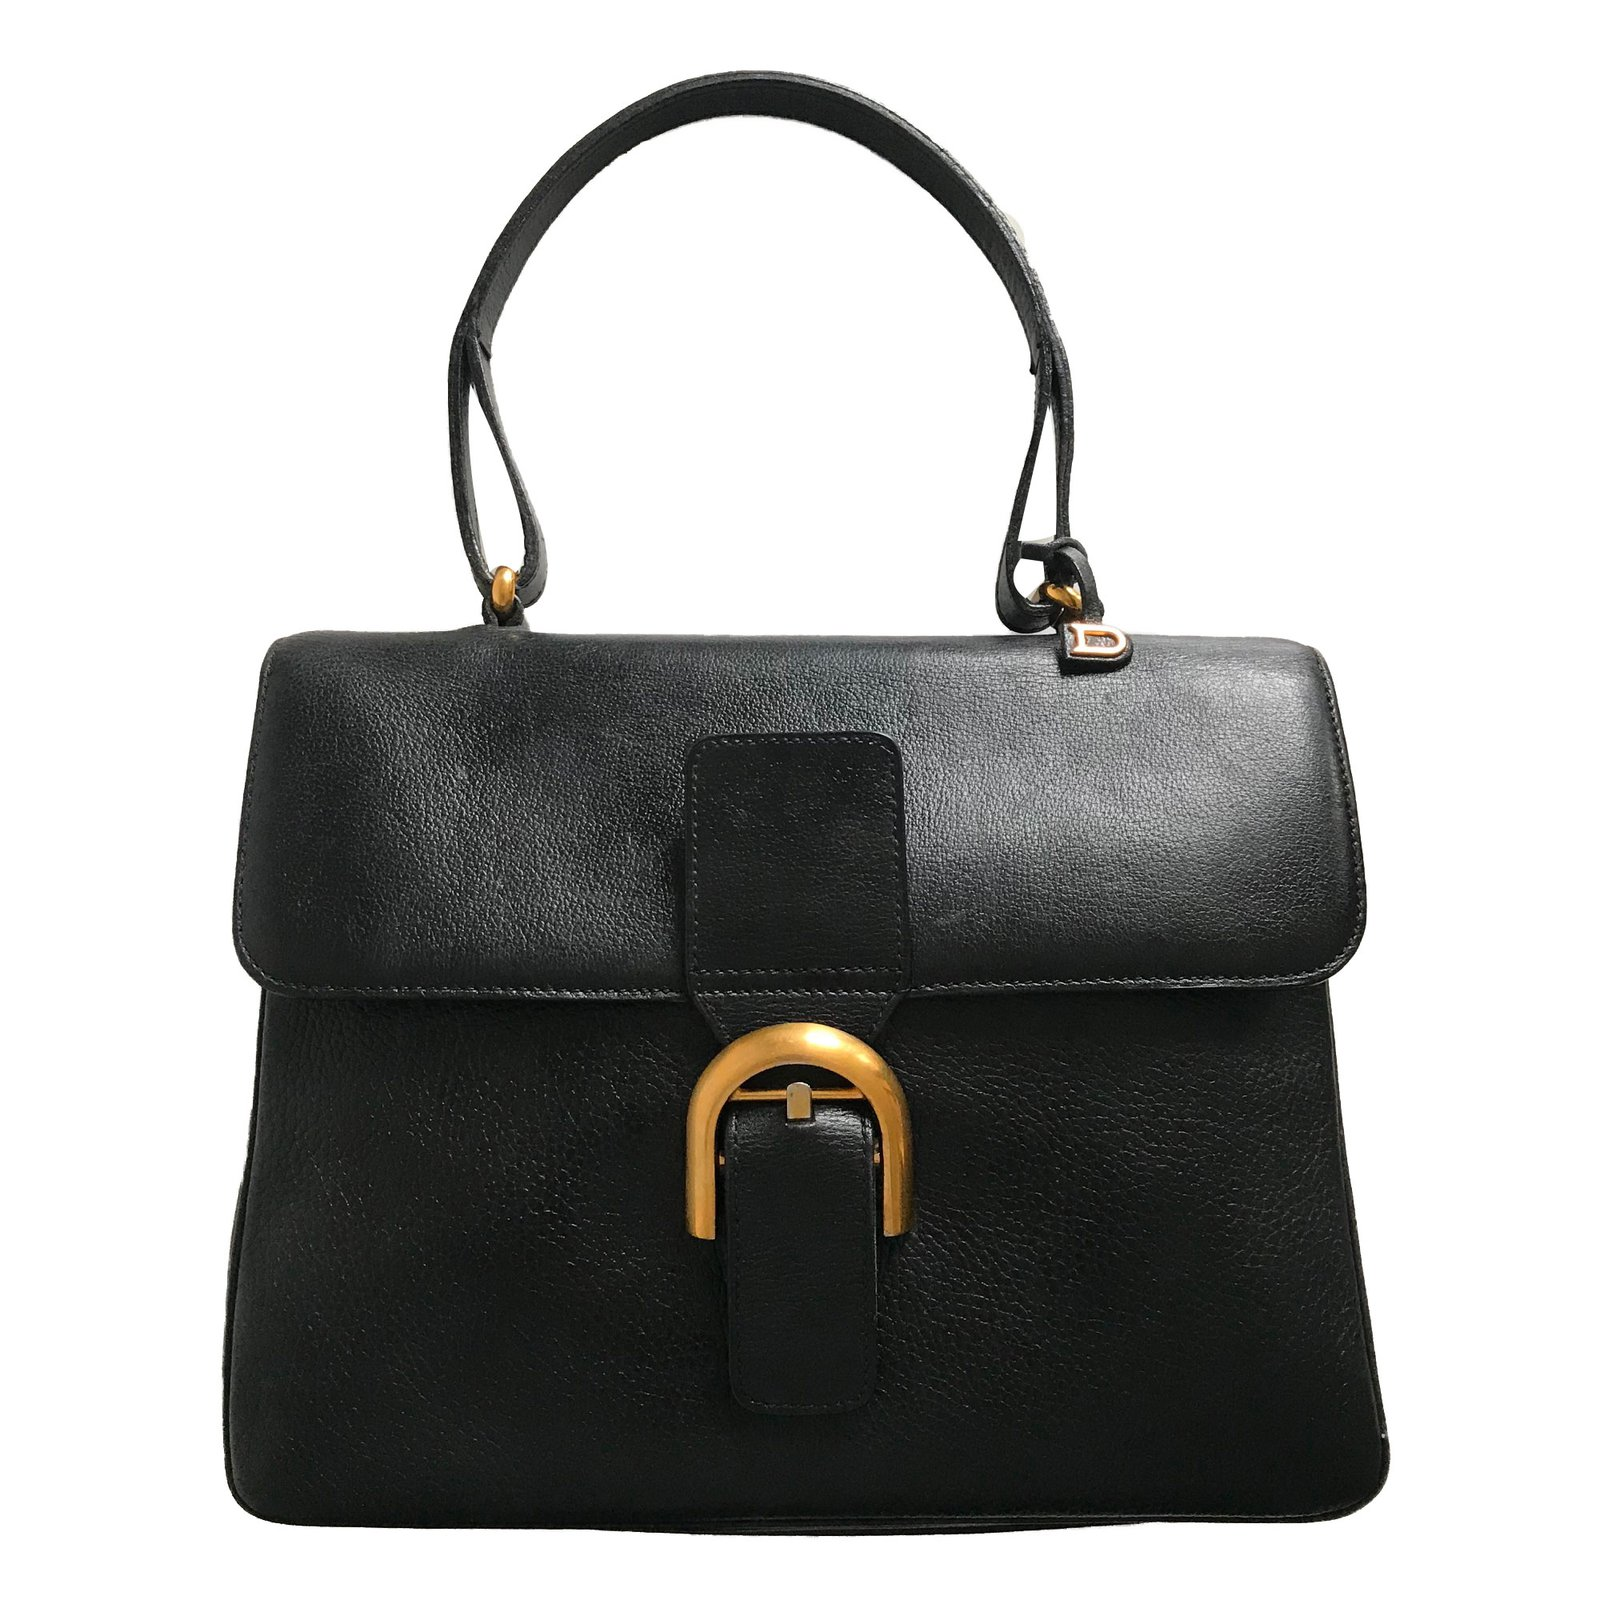 Delvaux Handbags Leather Black Ref 59664